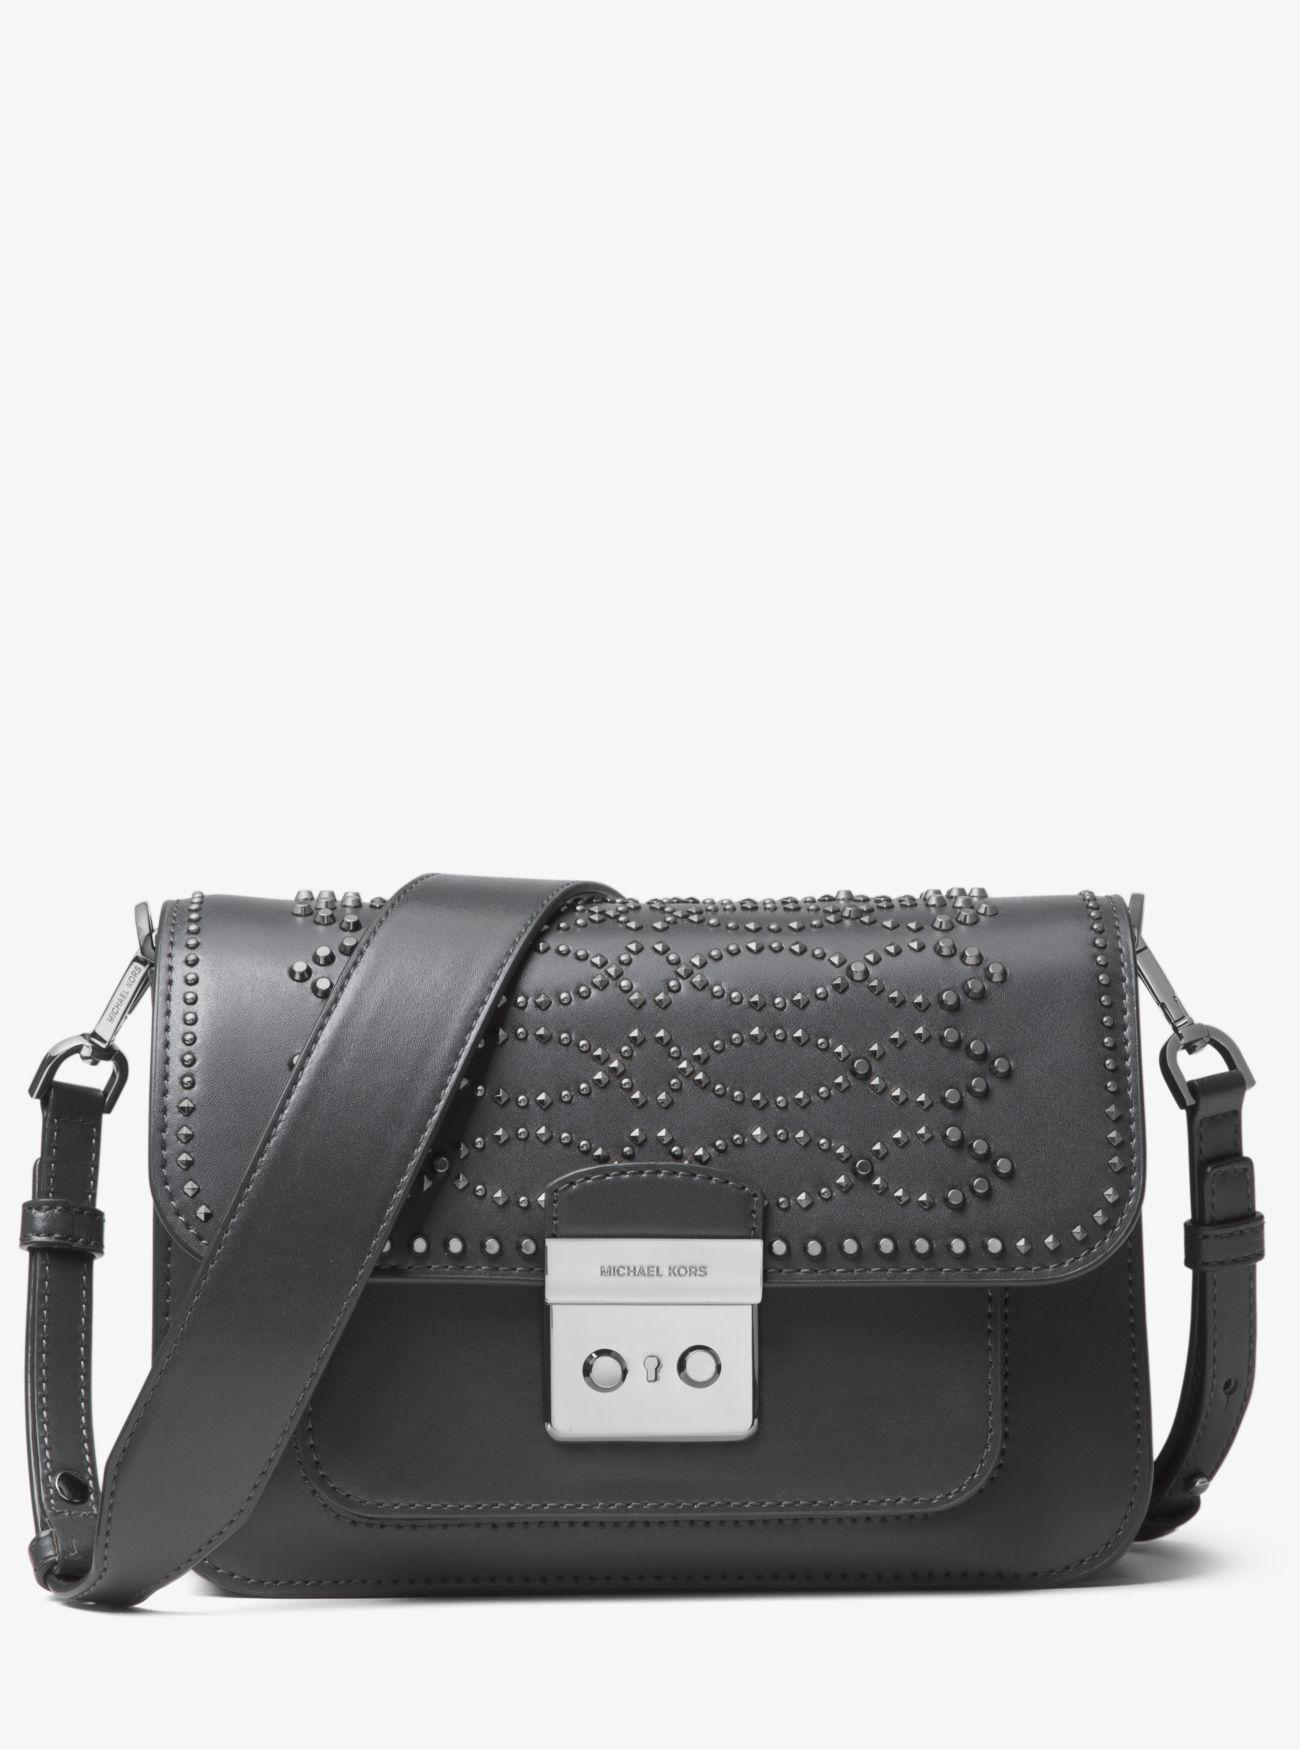 dea6119a53d0 MICHAEL Michael Kors. Women's Gray Sloan Editor Studded Leather Shoulder Bag